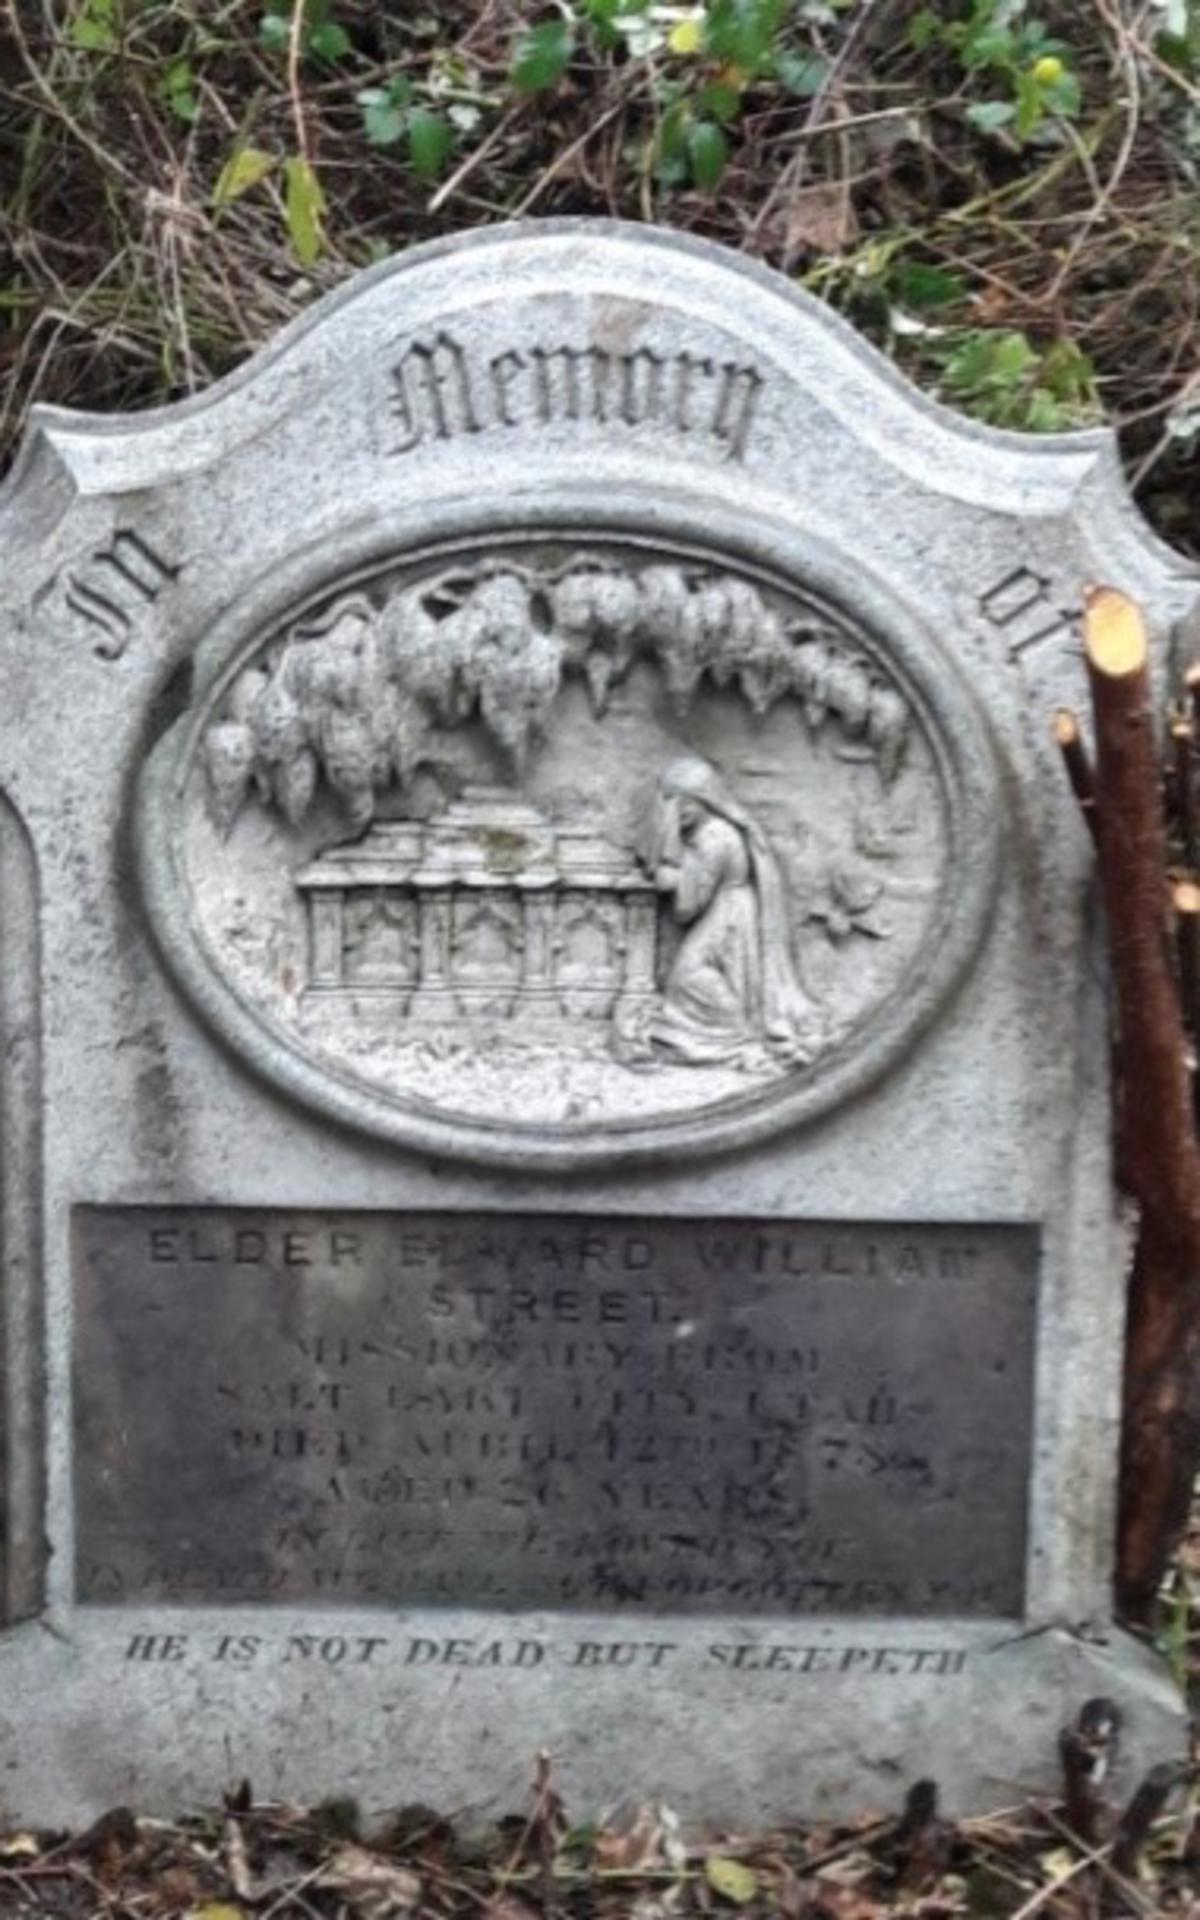 Stone of Edwin William Street